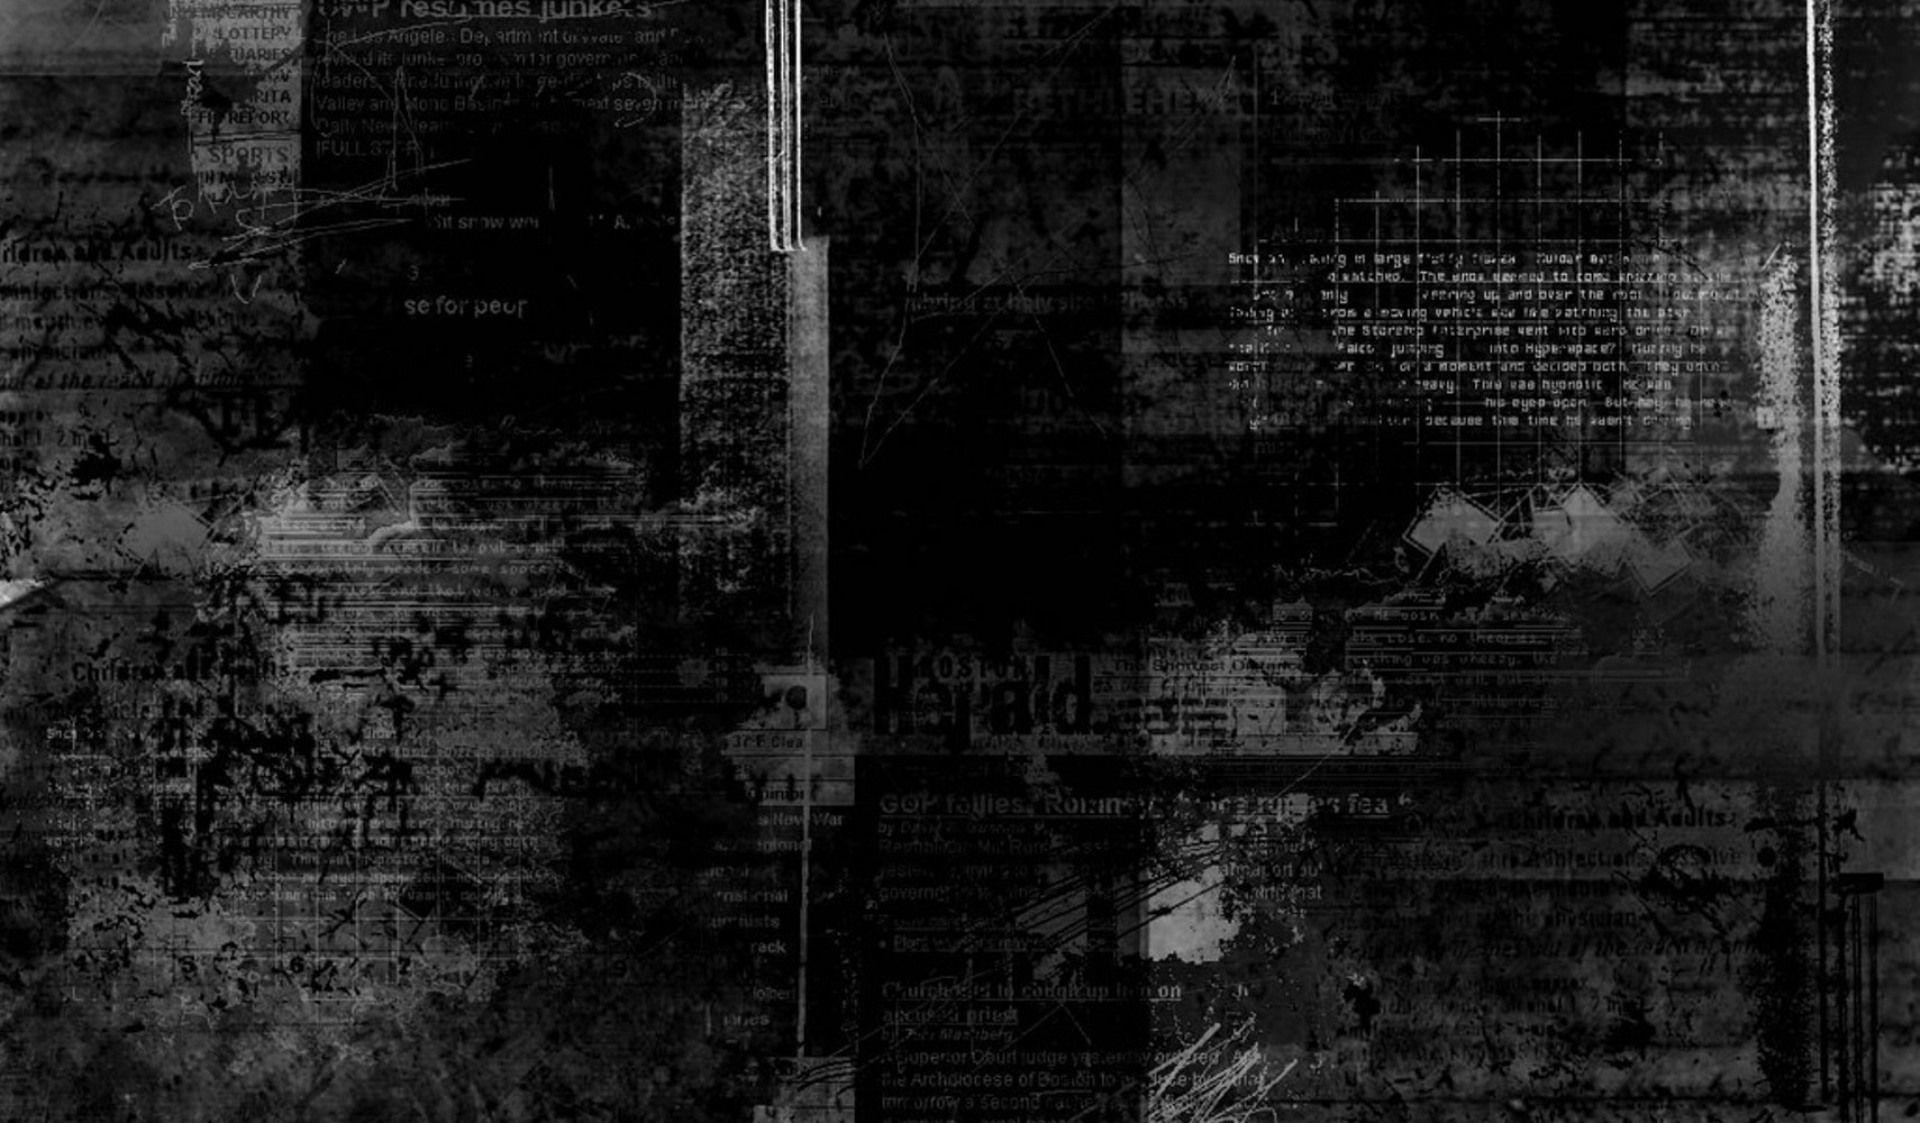 Dark Abstract Backgrounds - WallpaperSafari Hd Wallpaper 1920x1080